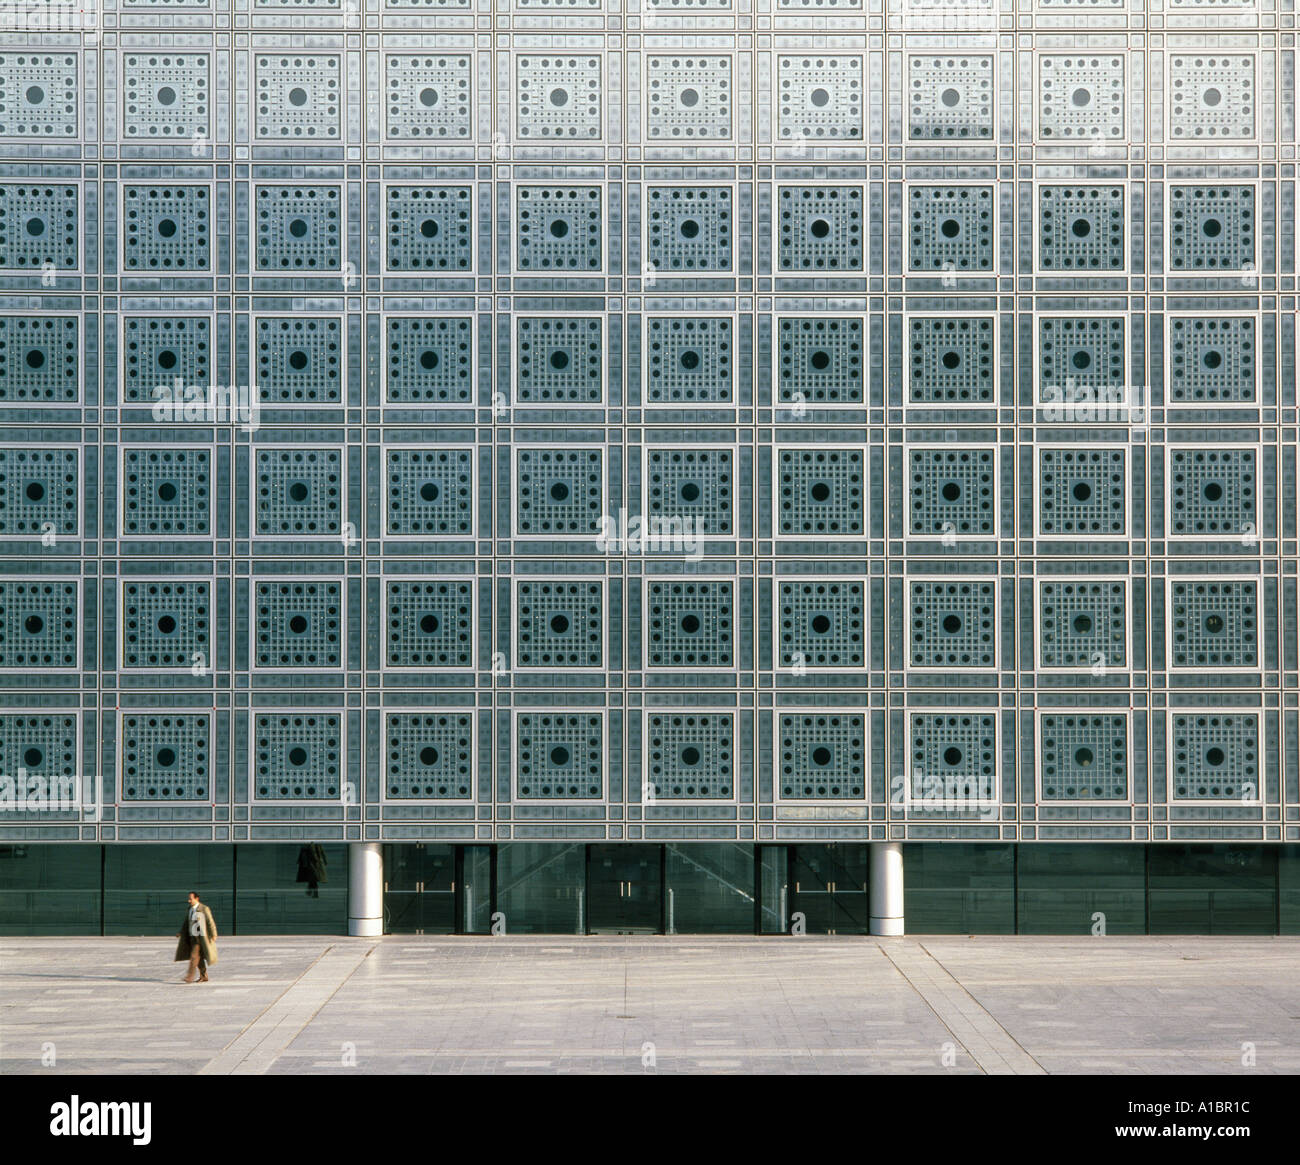 Institut du Monde Arabe, facciata sud, Parigi, 1987. Finestra fotosensibile schermate. Architetto: Jean Nouvel Immagini Stock